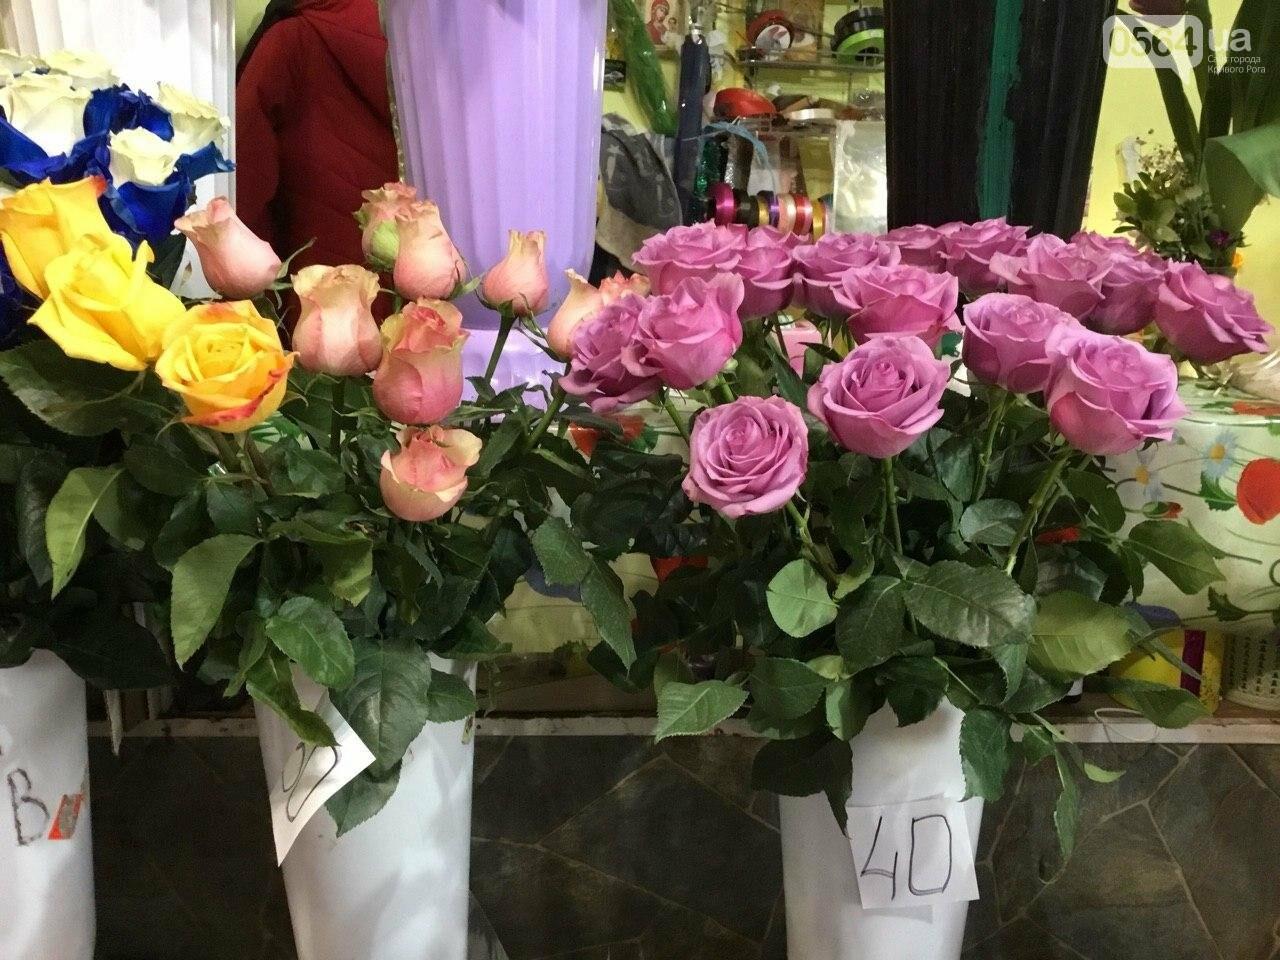 Сколько стоят примула, цикламен, мимоза? Обзор цен на цветы в Кривом Роге, - ФОТО, ВИДЕО, фото-3